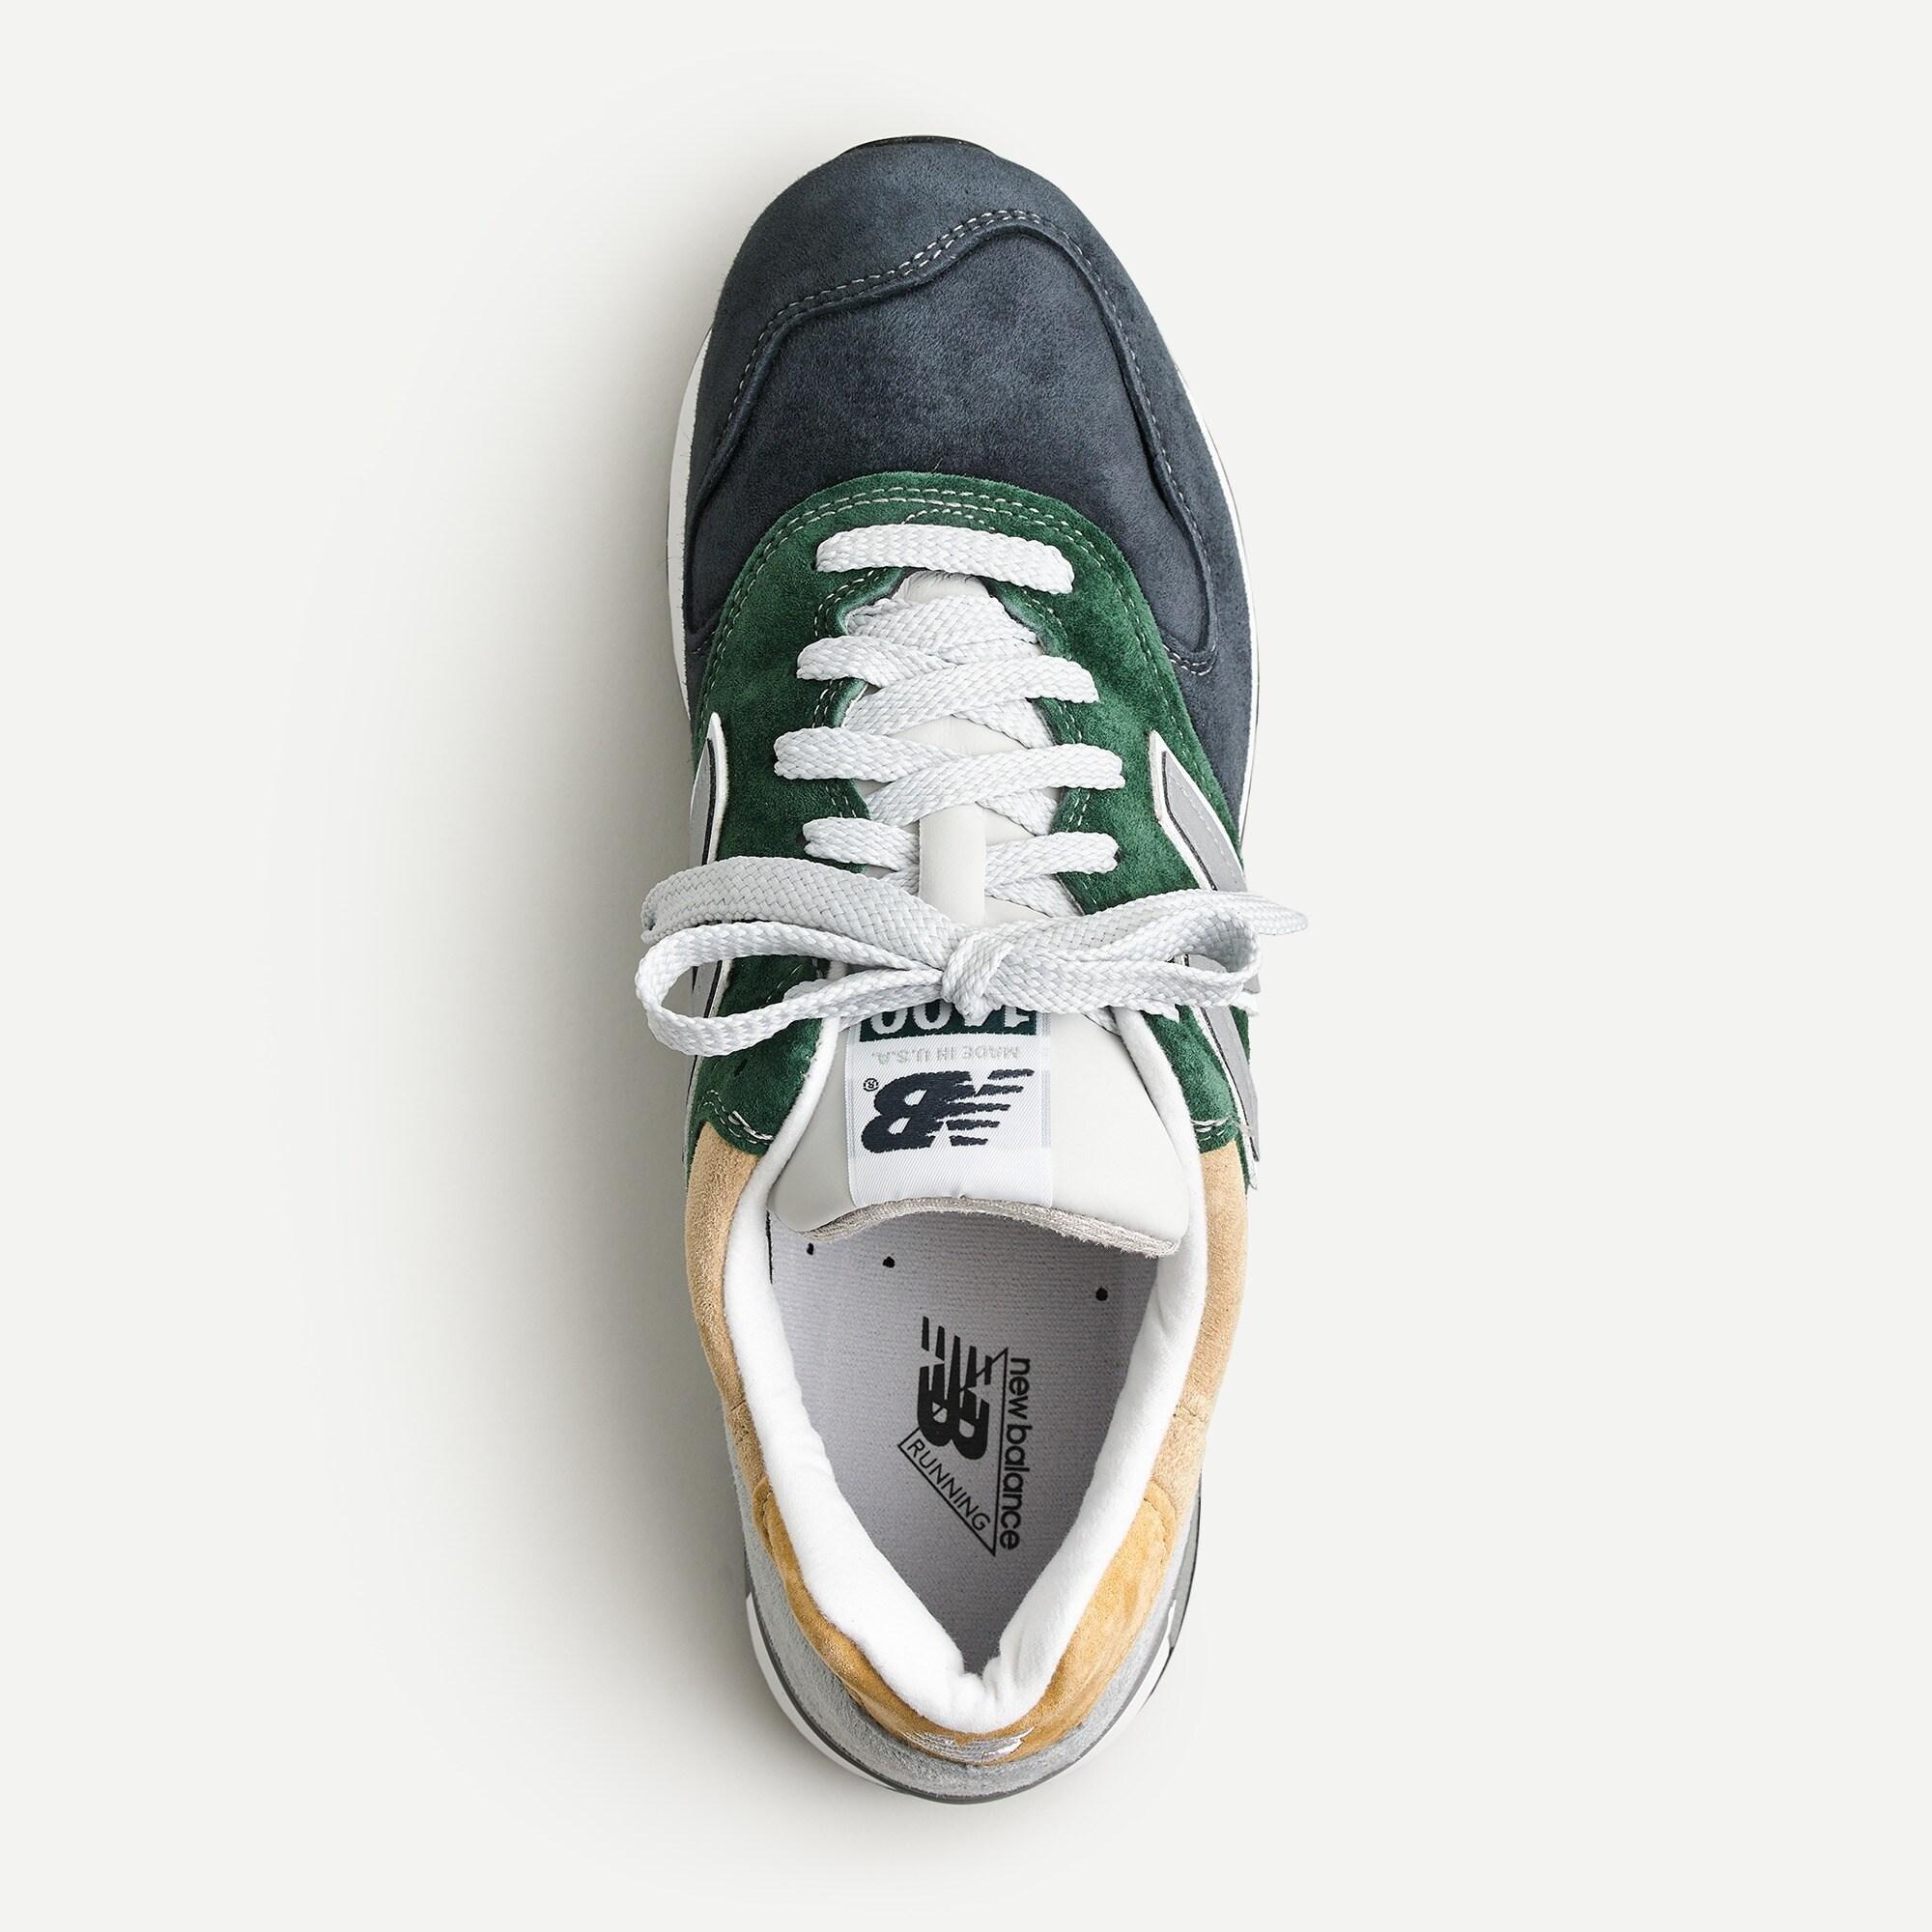 ® X J.crew 1400 Colorblocked Sneakers